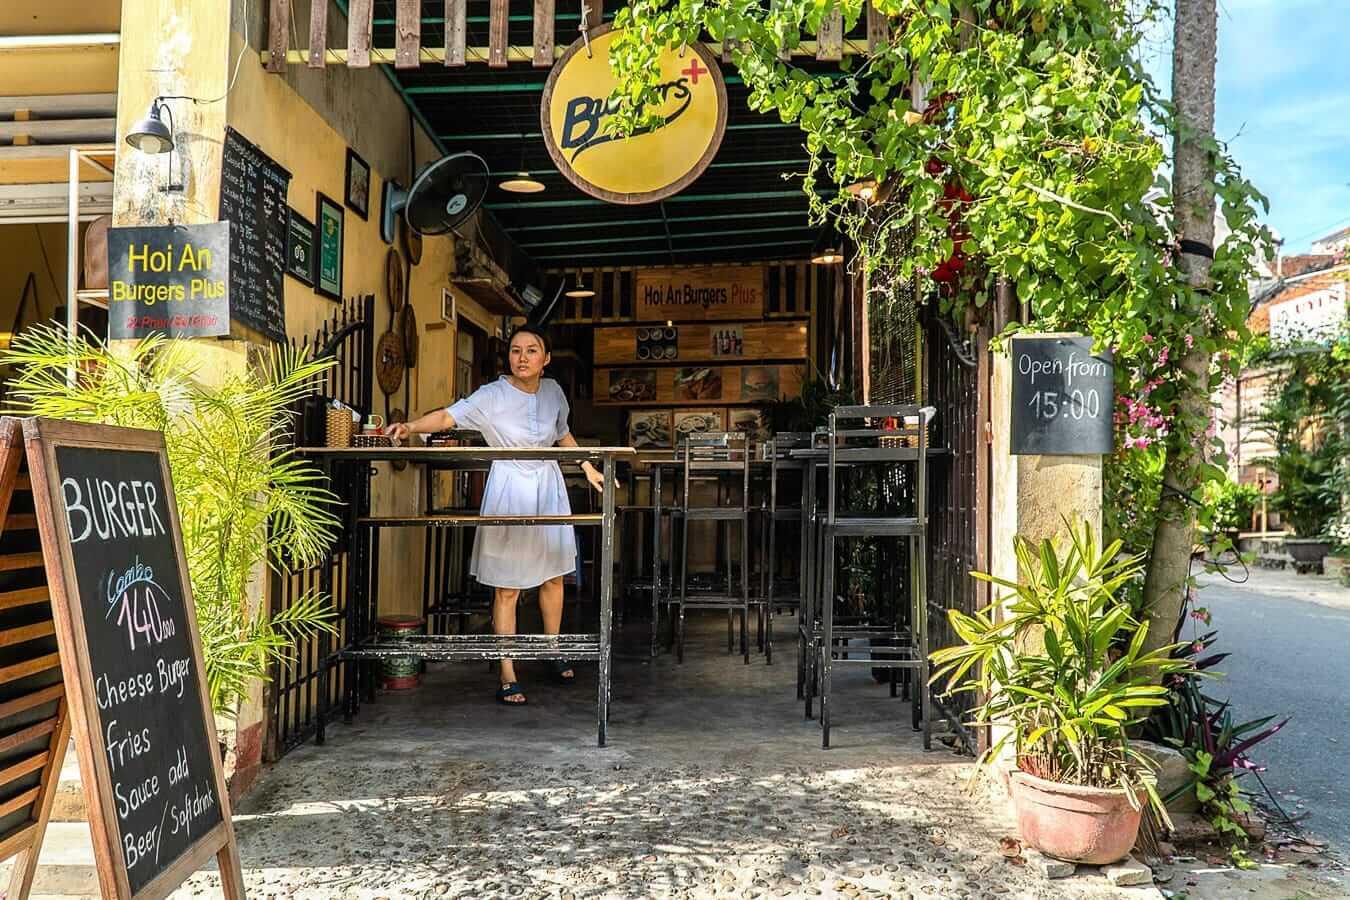 Hoi An Burger Plus: Western Hoi An Restaurants